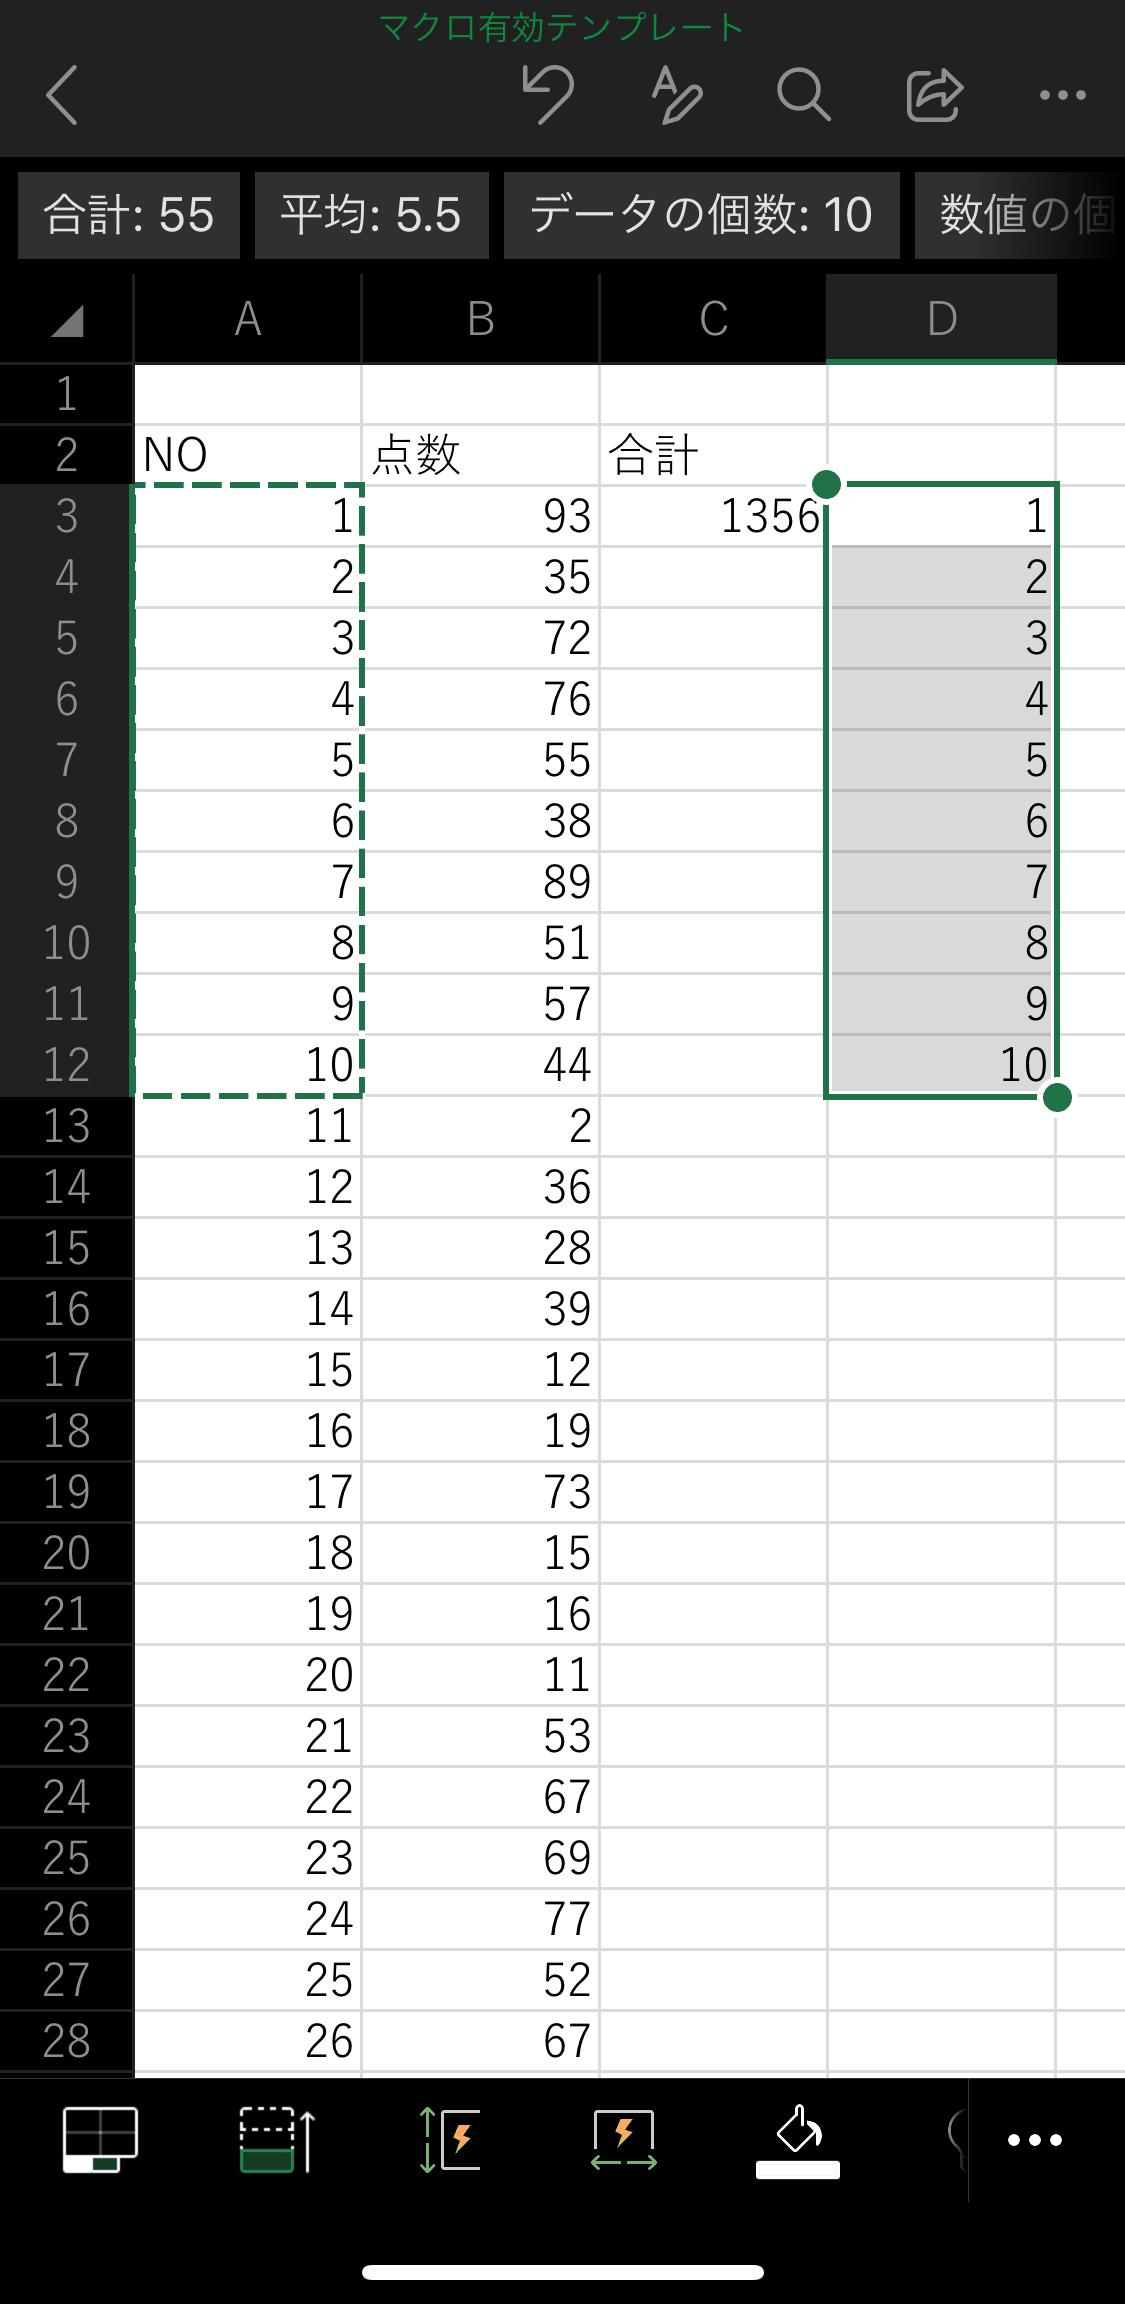 iPhoneでのエクセルアプリの使い方・編集方法・保存方法22